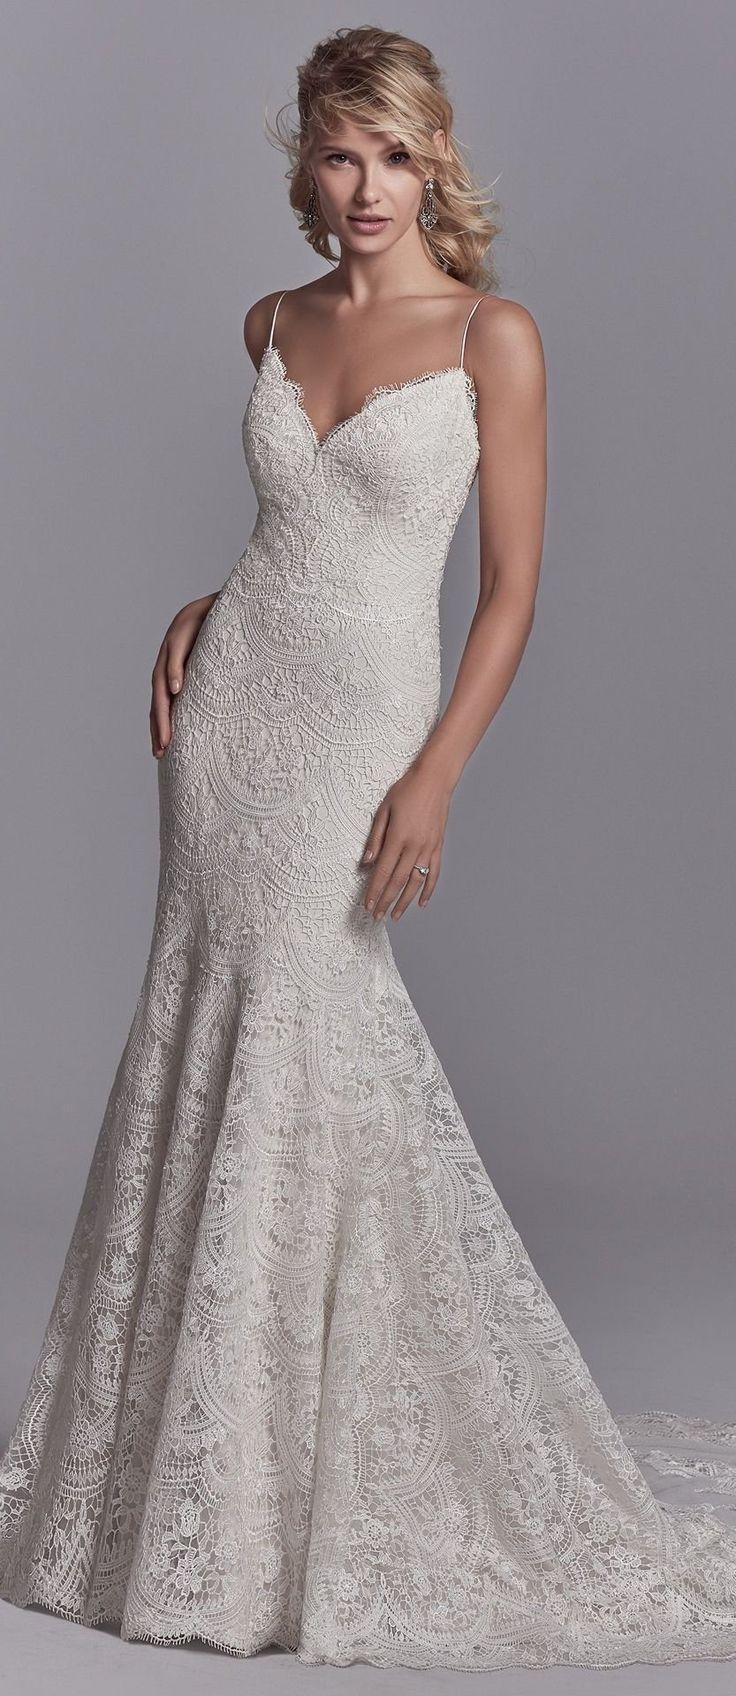 Boda - Maggie Sottero Wedding Dresses